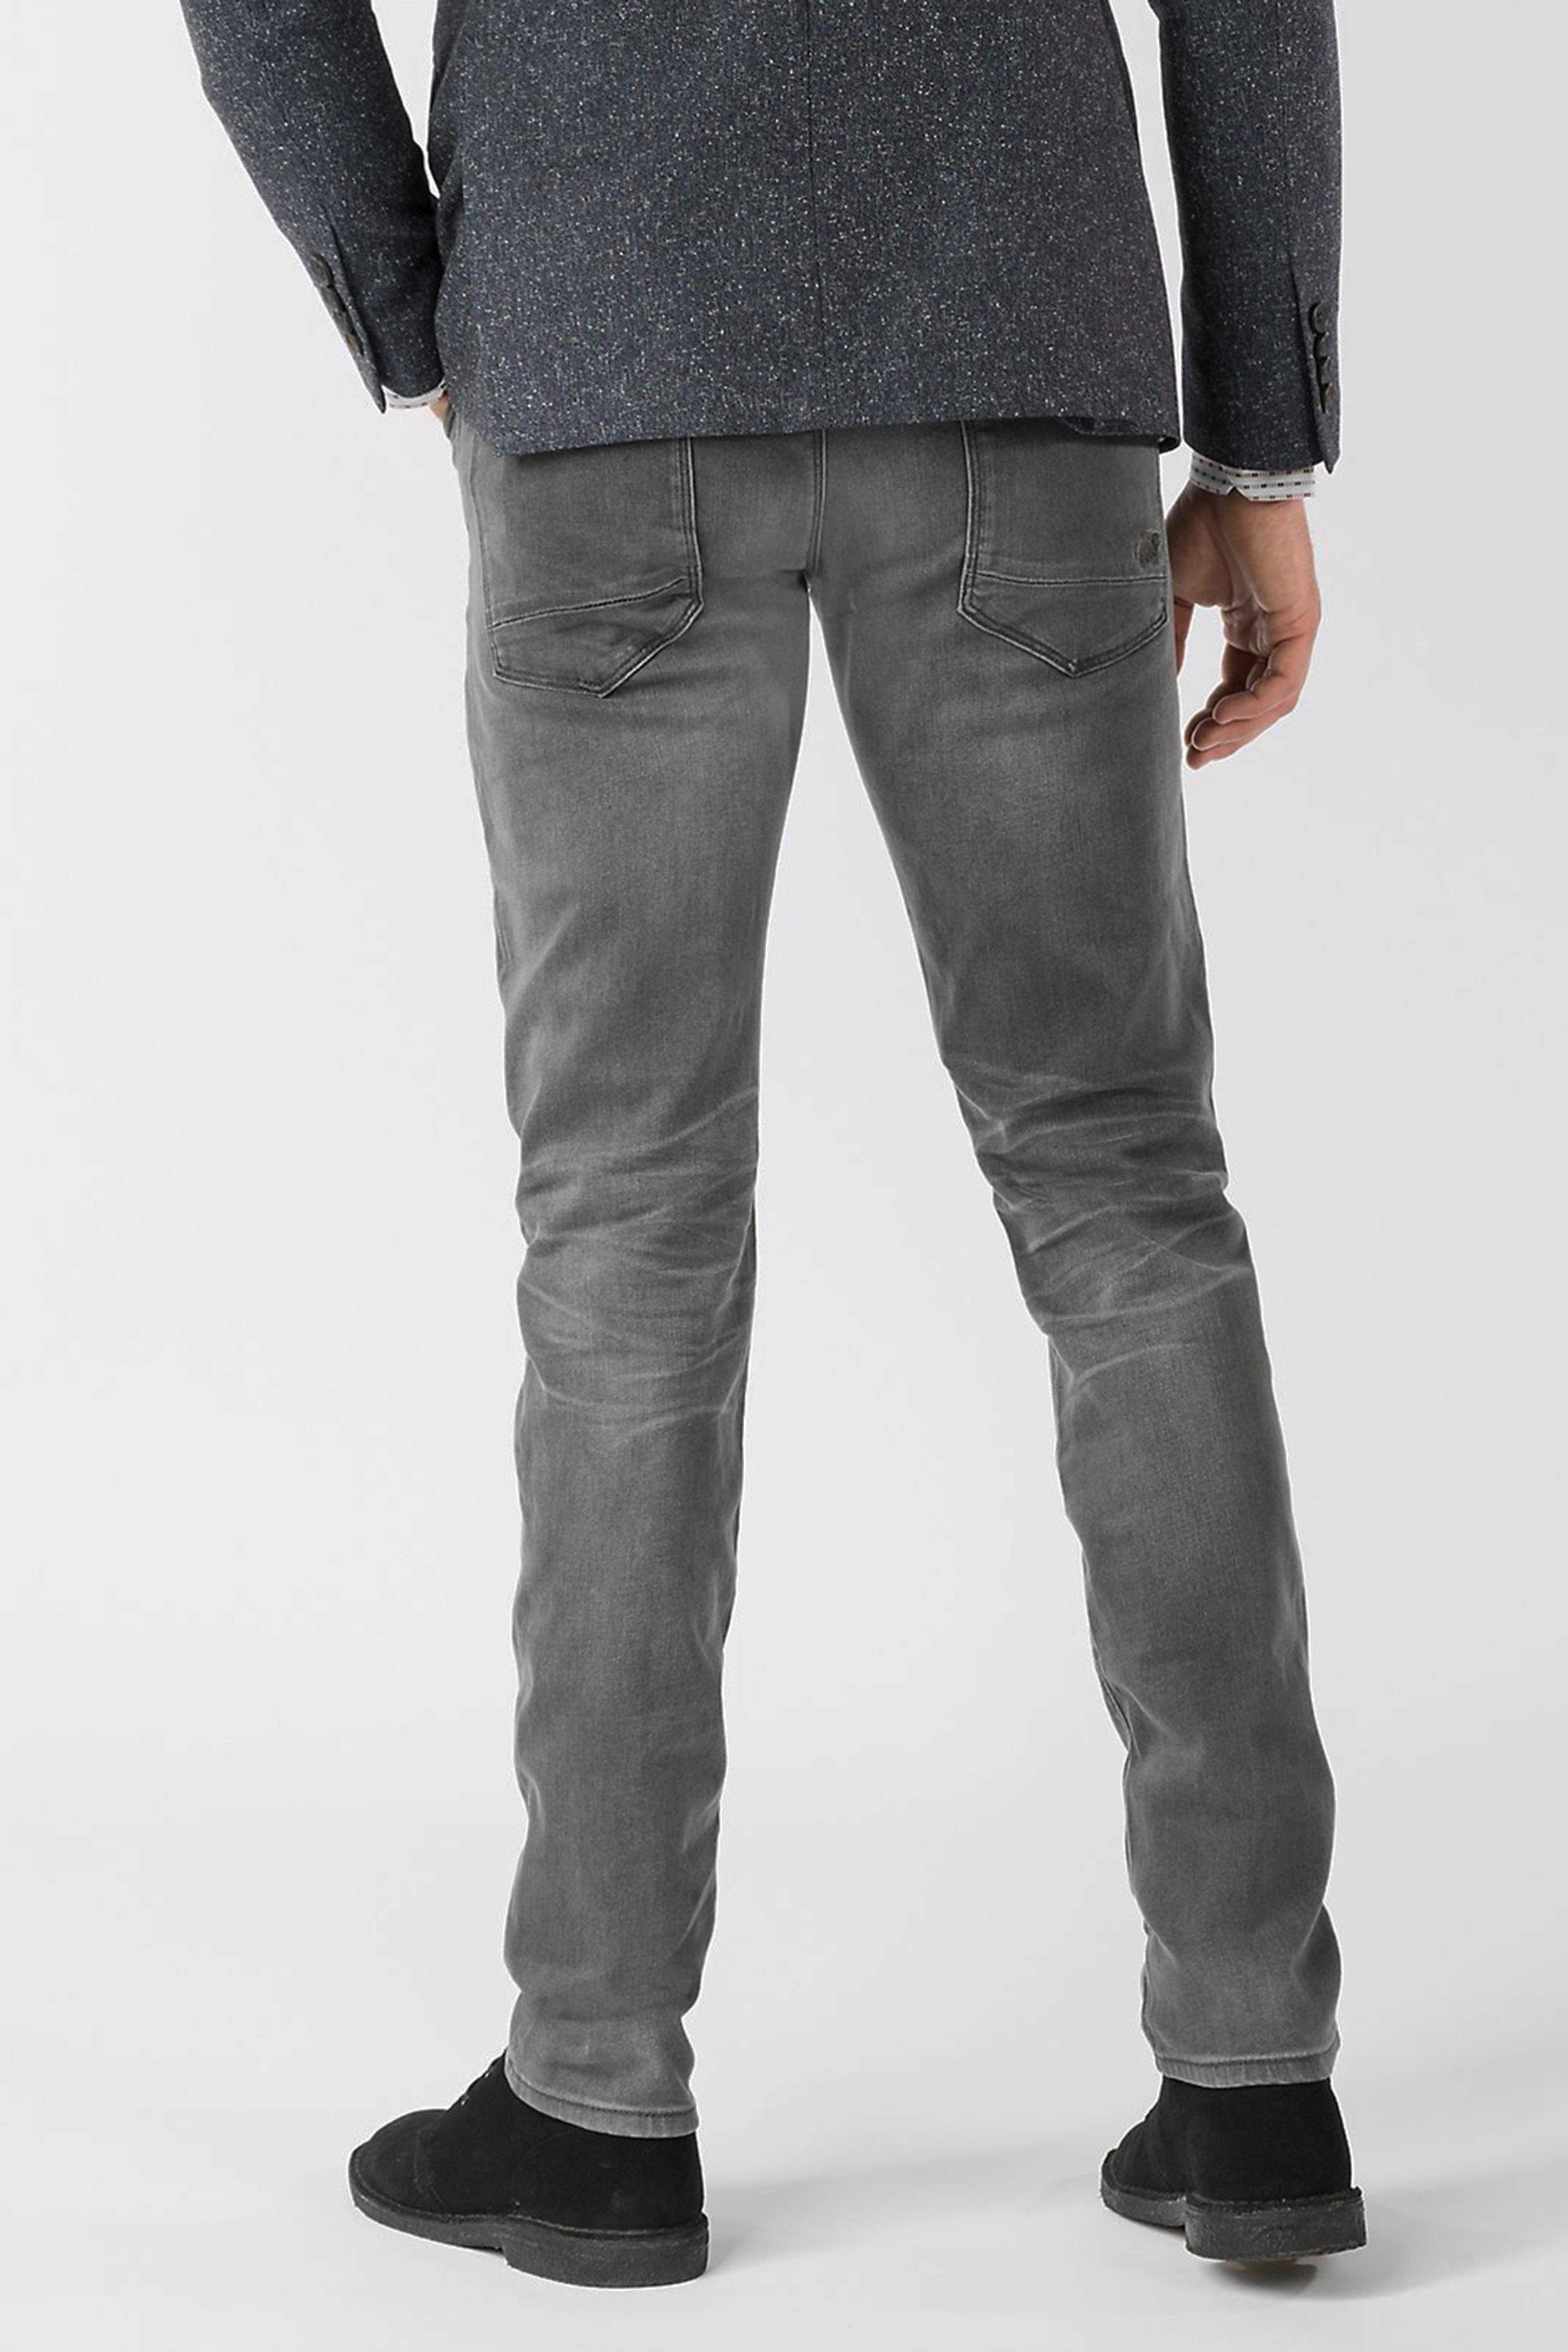 Vanguard V7 Rider Jeans Antraciet foto 6